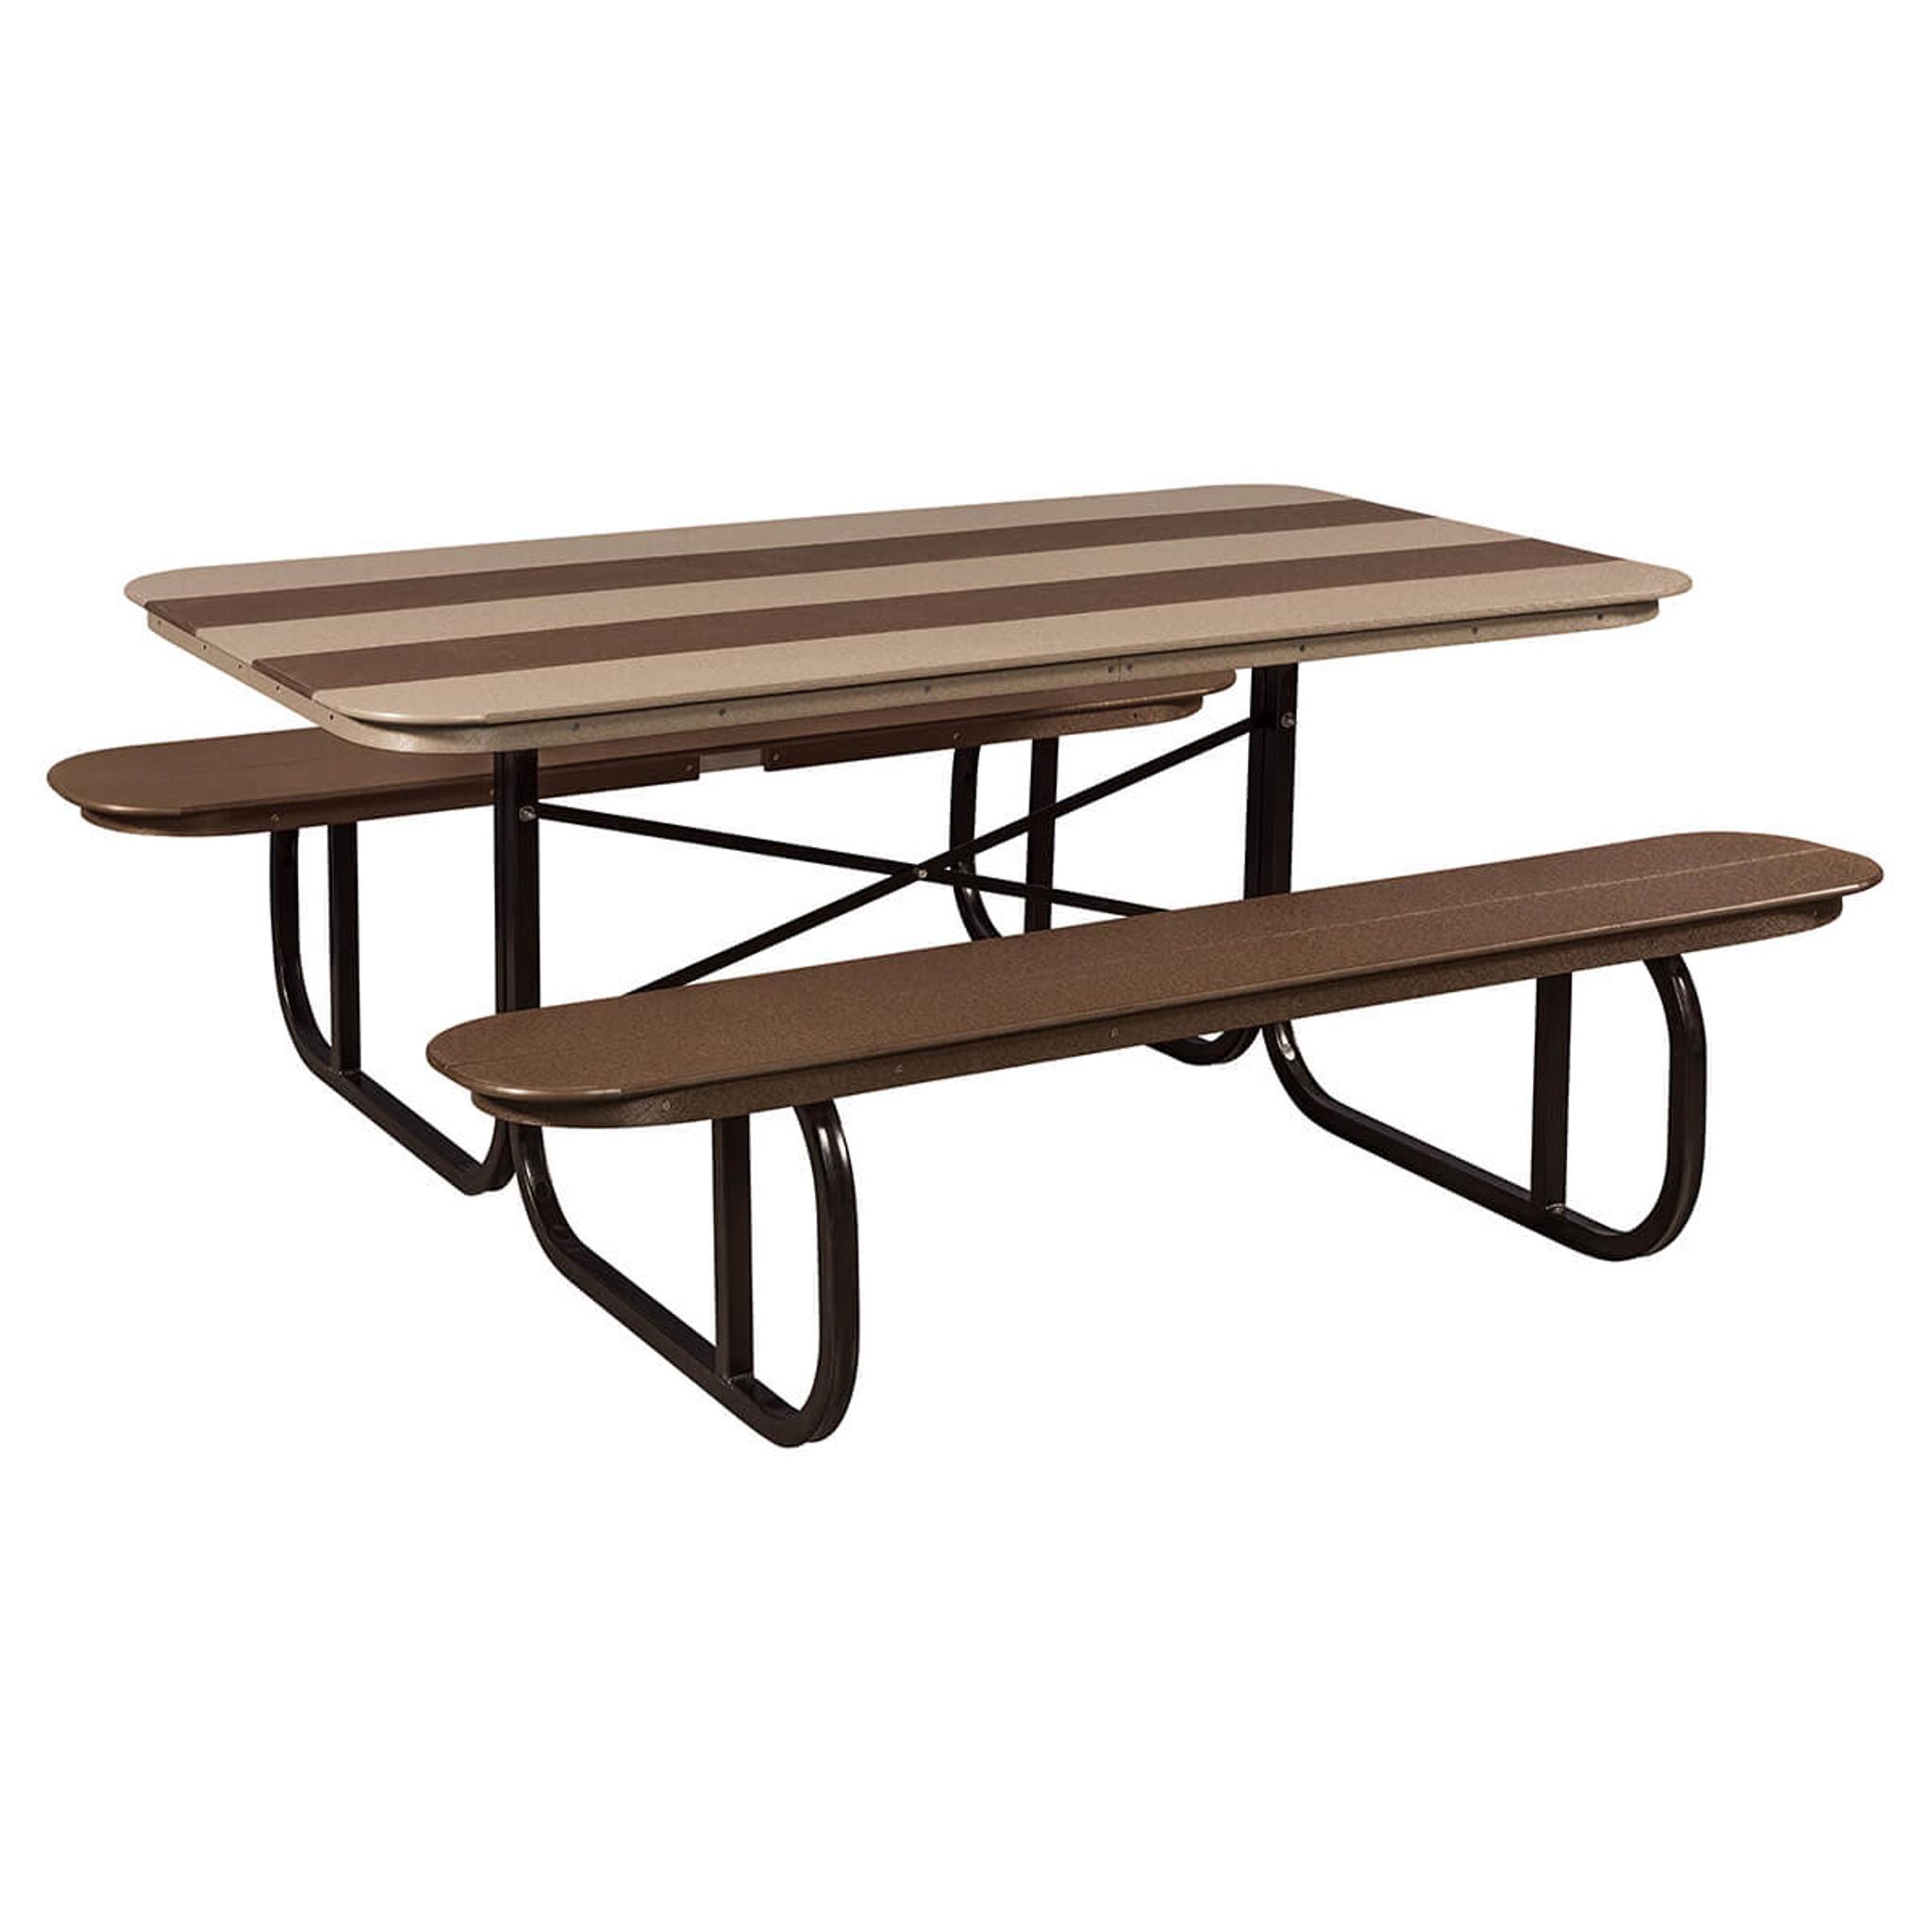 Picnic Table Poly With Metal Base Mattie Lu - Metal base picnic table